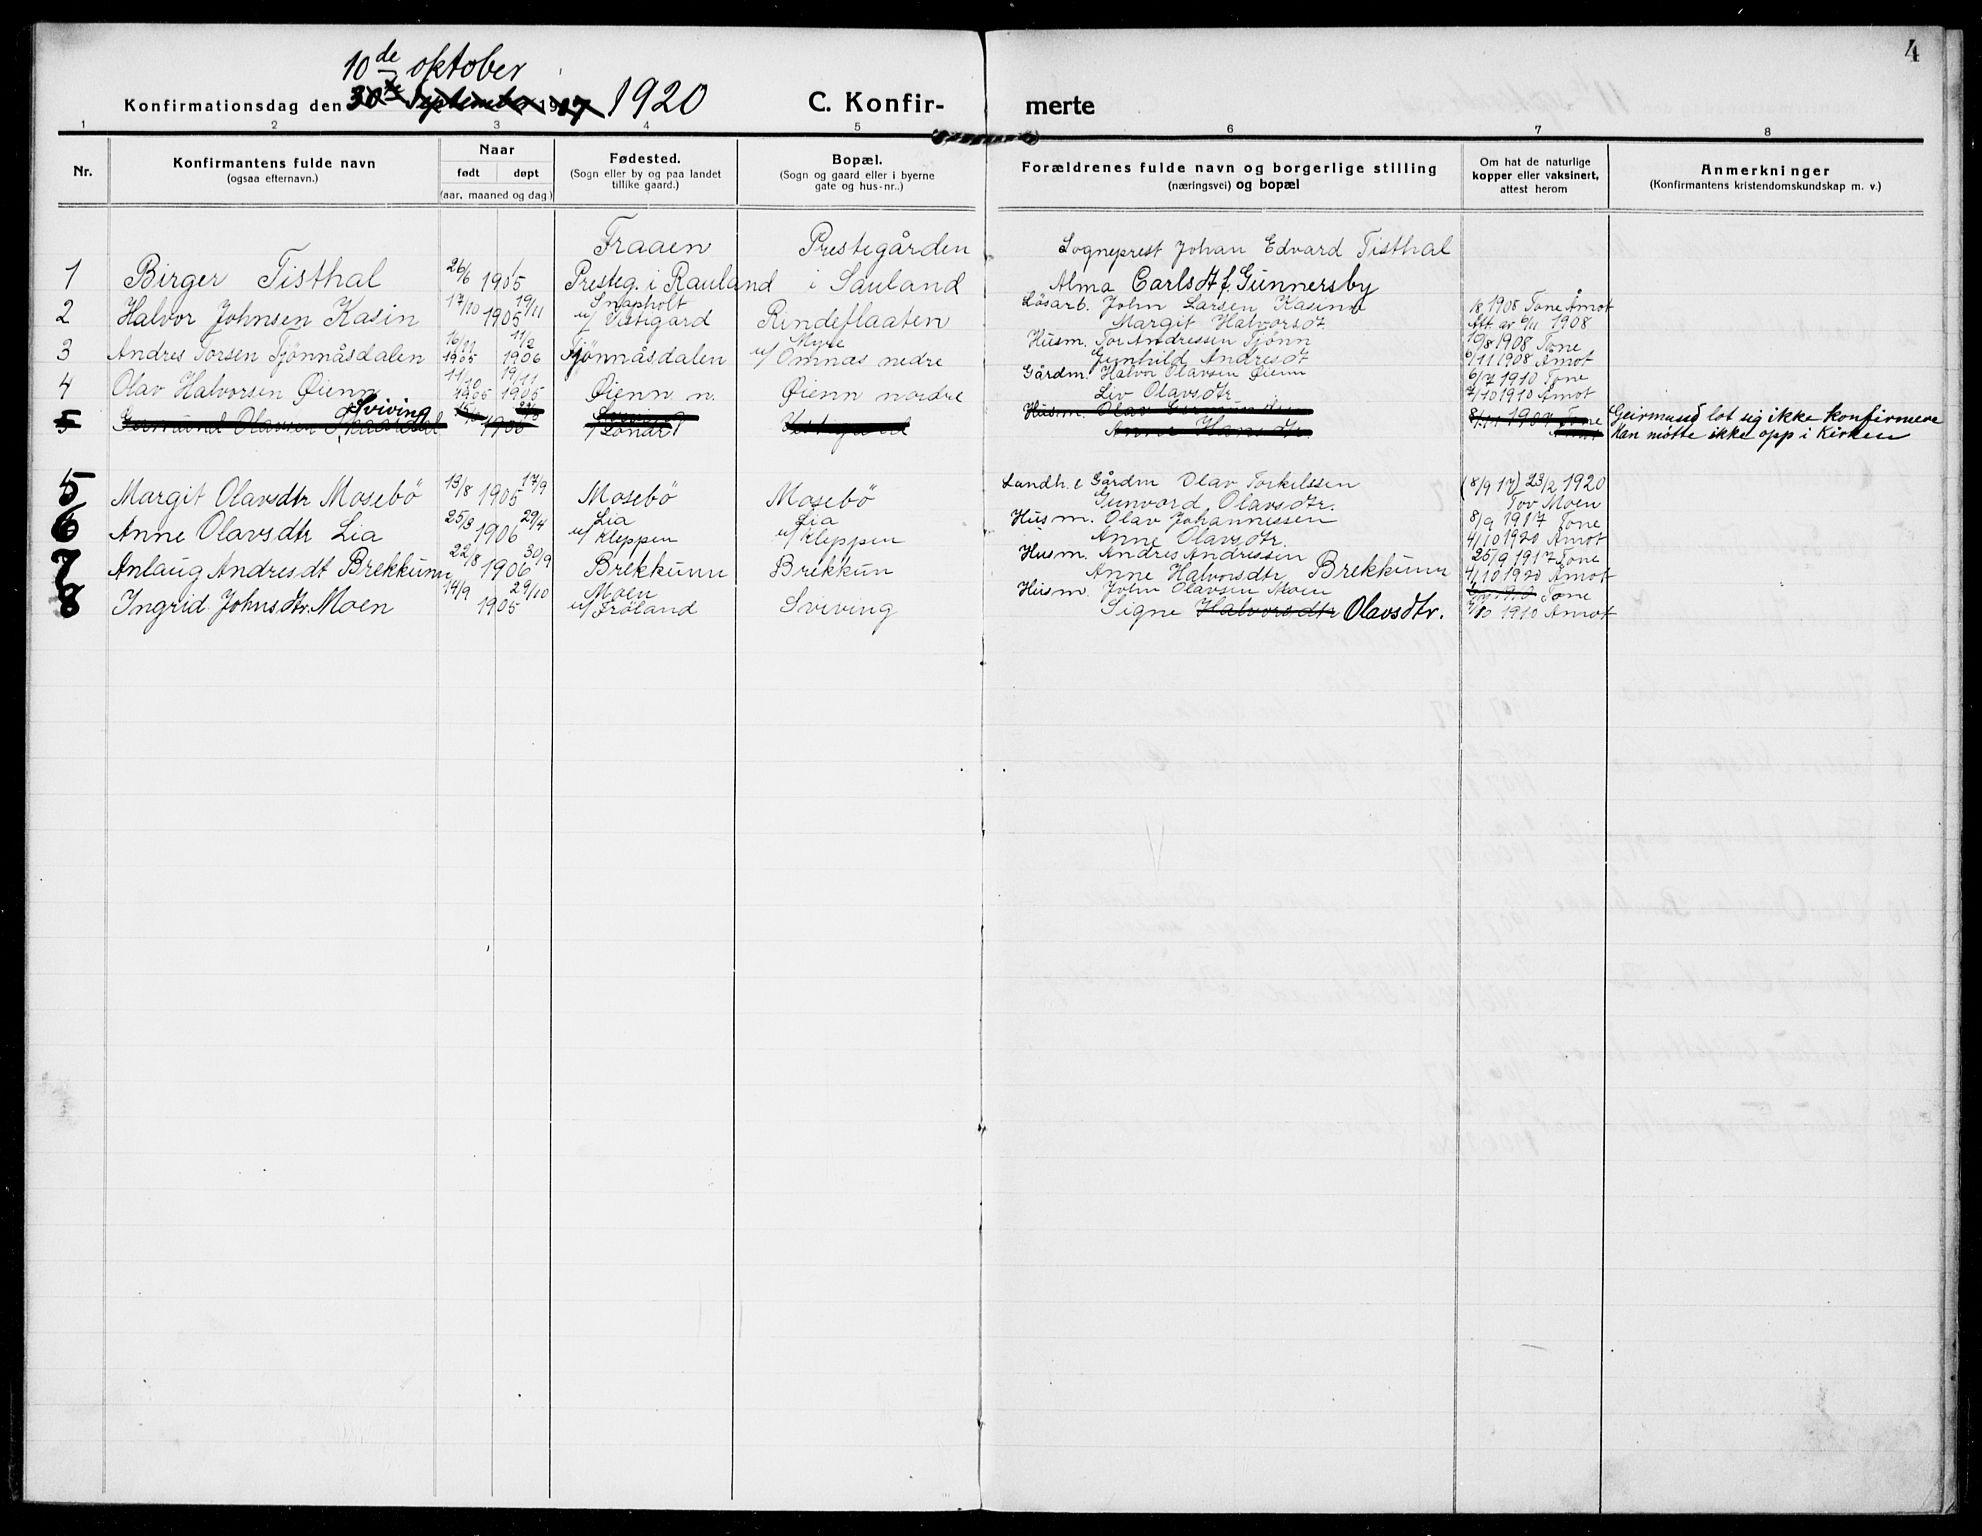 SAKO, Hjartdal kirkebøker, F/Fb/L0003: Ministerialbok nr. II 3, 1920-1932, s. 4